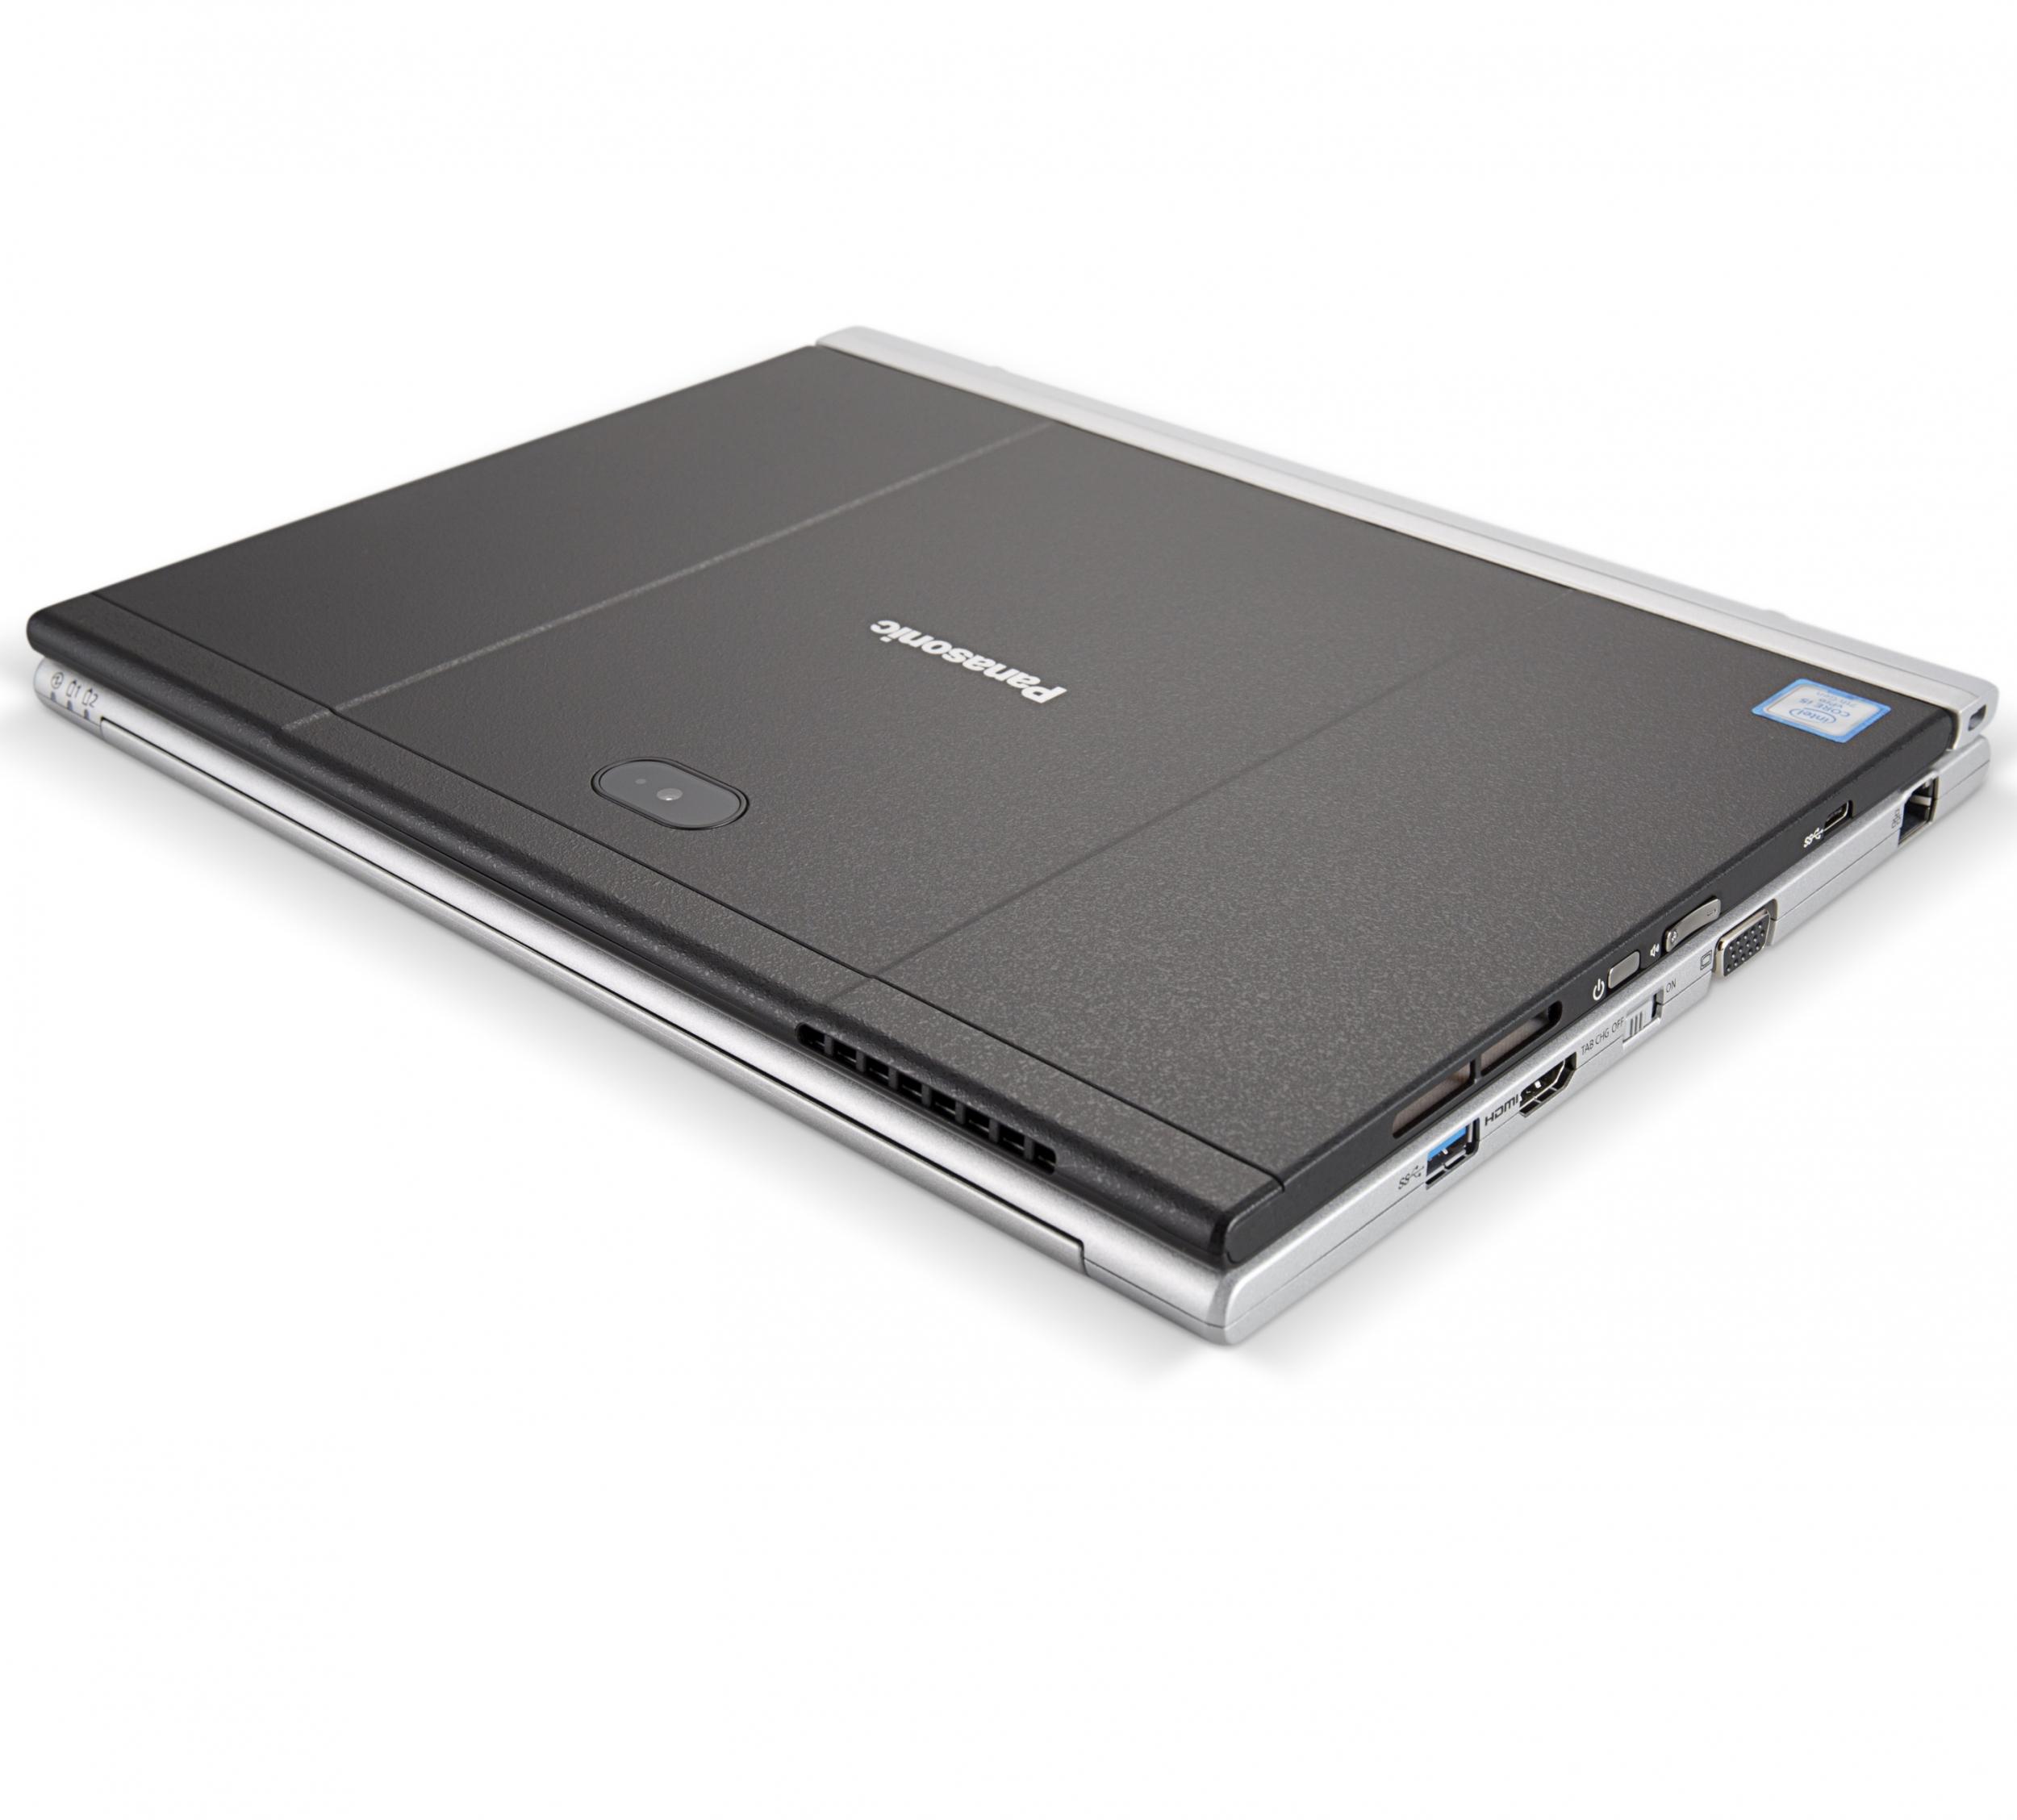 Panasonic Cf Xz6 Rugged Business Computing From Toughbook